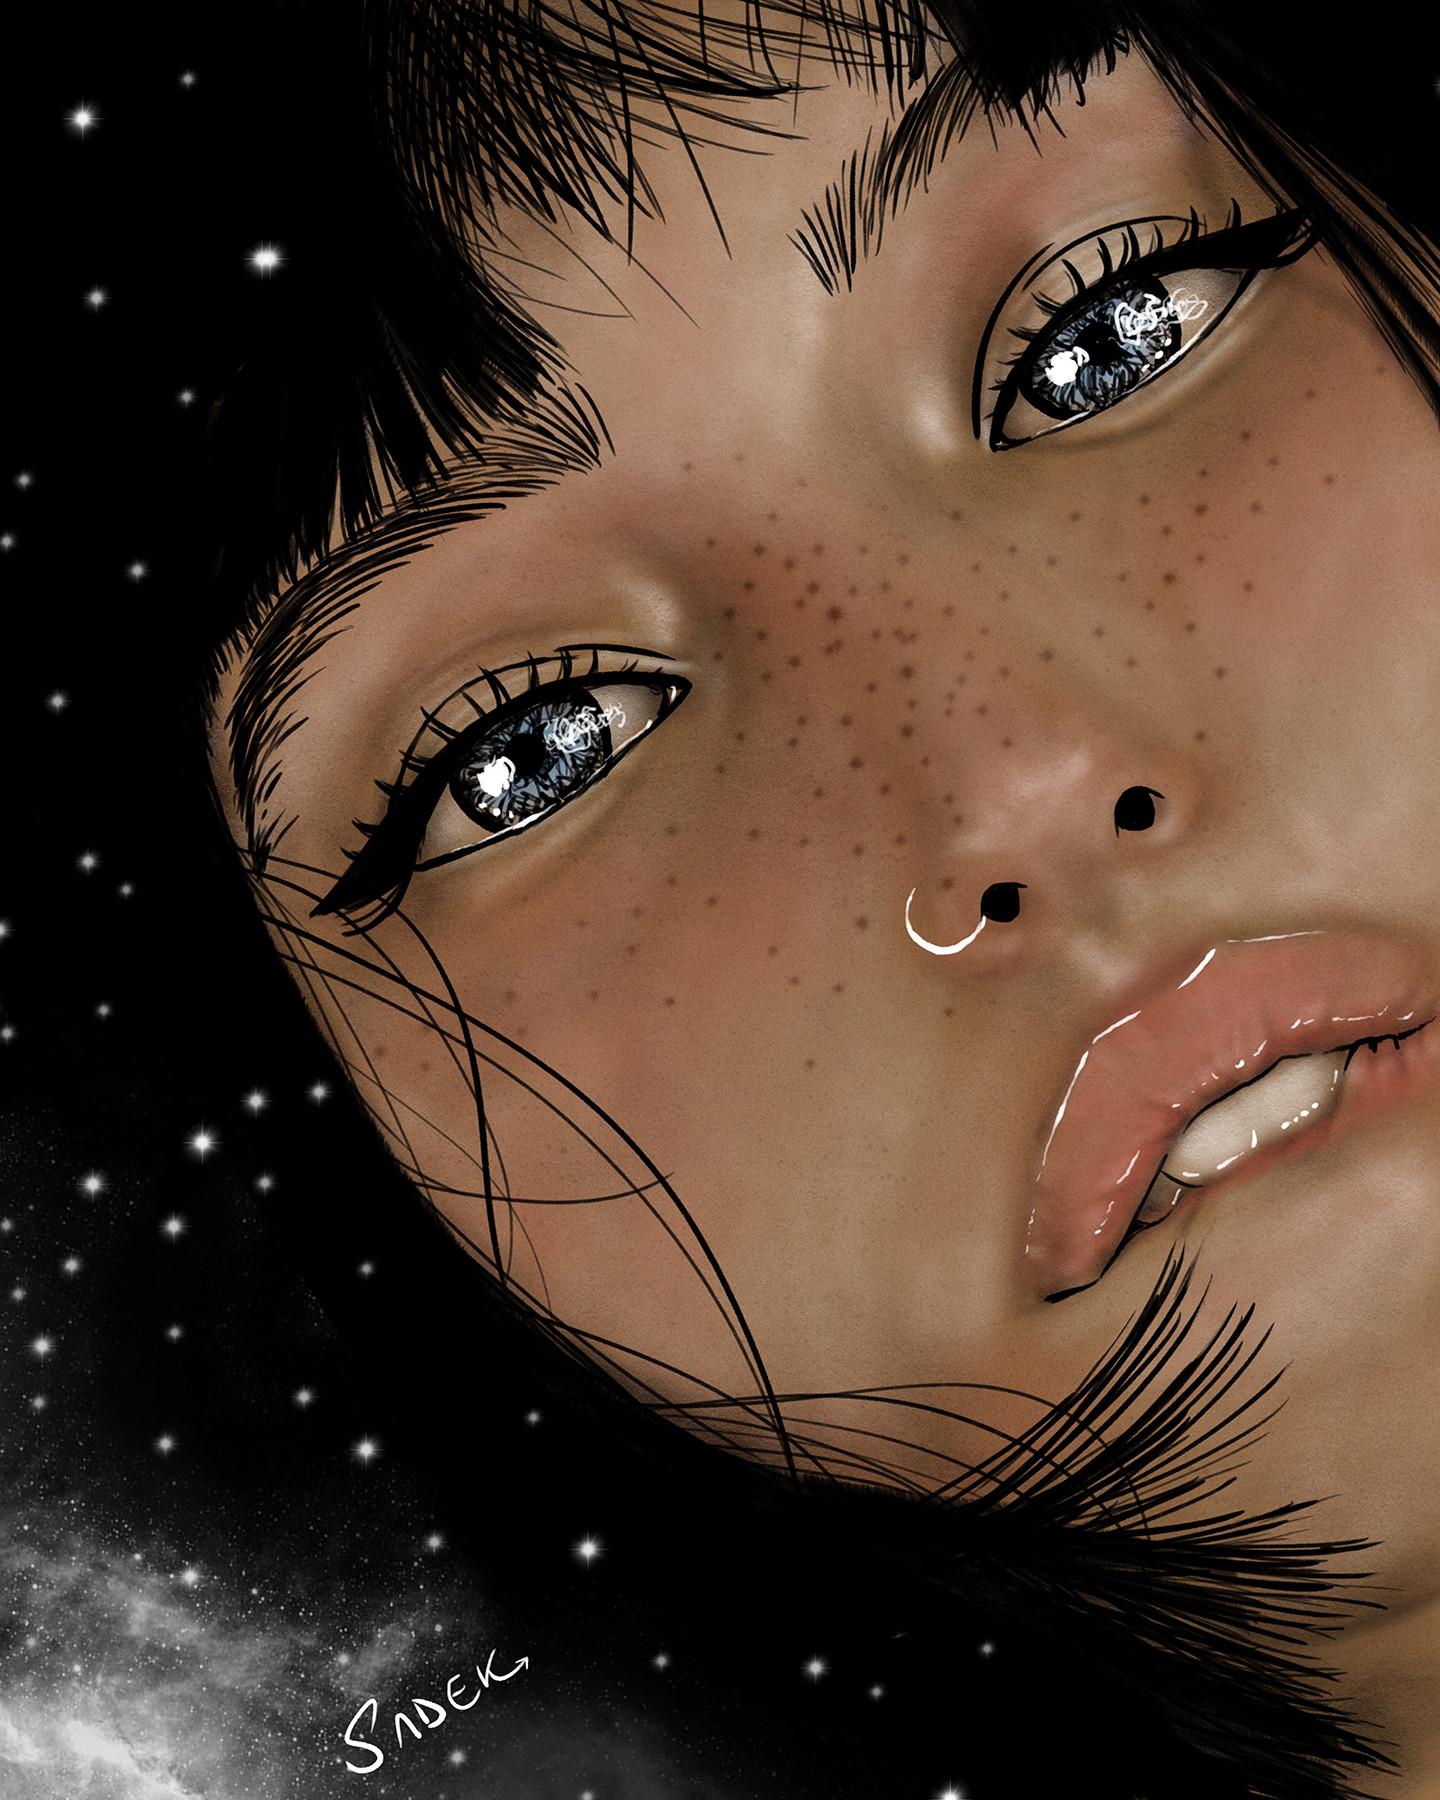 Stargazing | 12 x 9.6